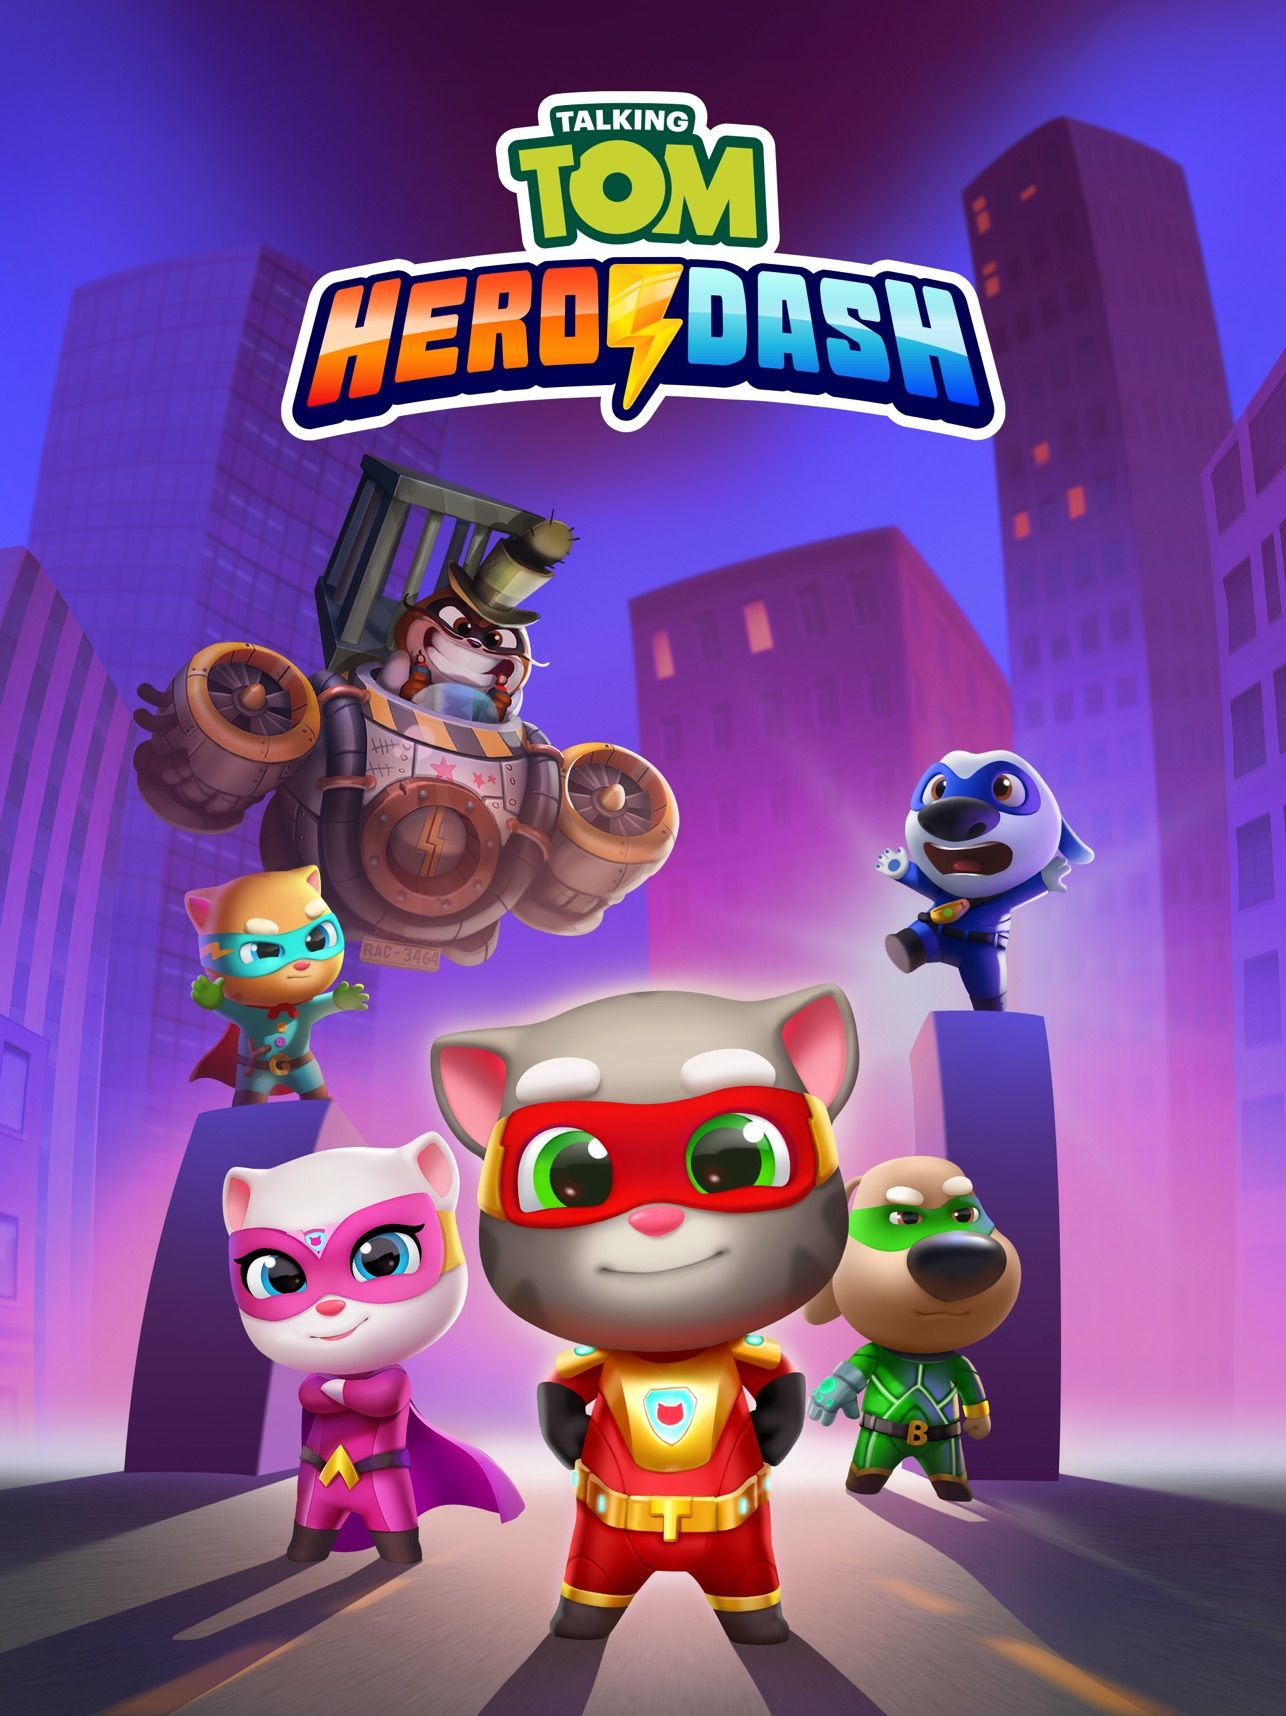 Talking Tom Hero Dash Run Game On The App Store Tatuagens De Personagens De Desenhos Animados Super Heroi Heroi